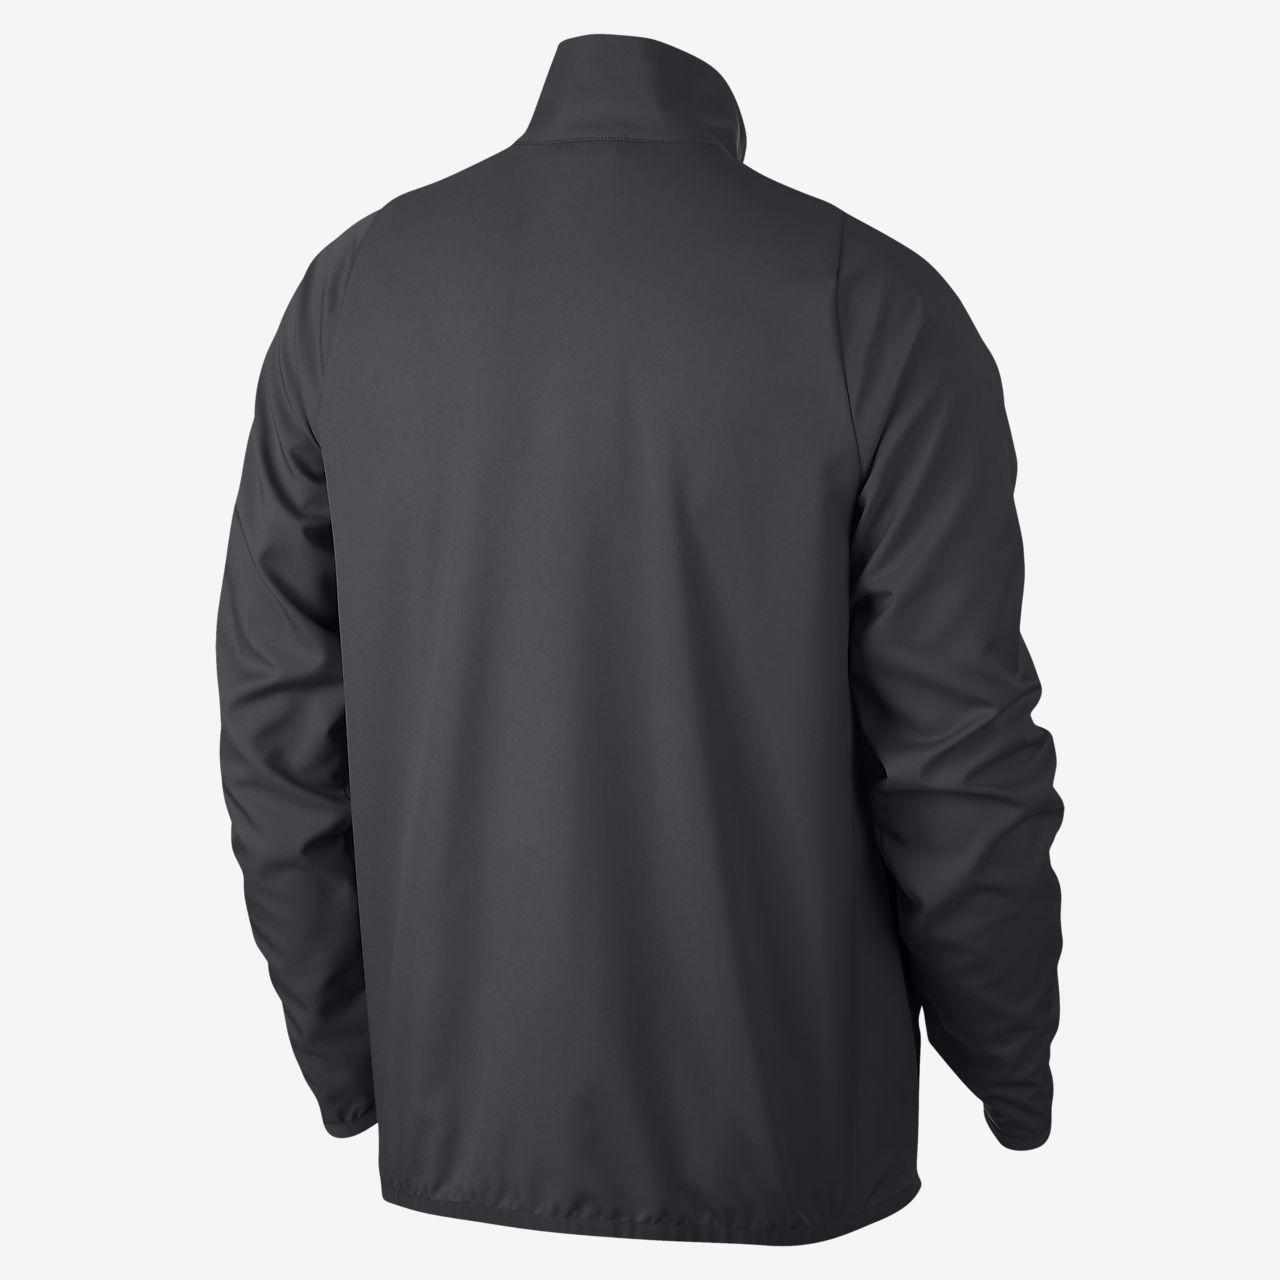 Nike® Dri FIT Rivalry Jacket